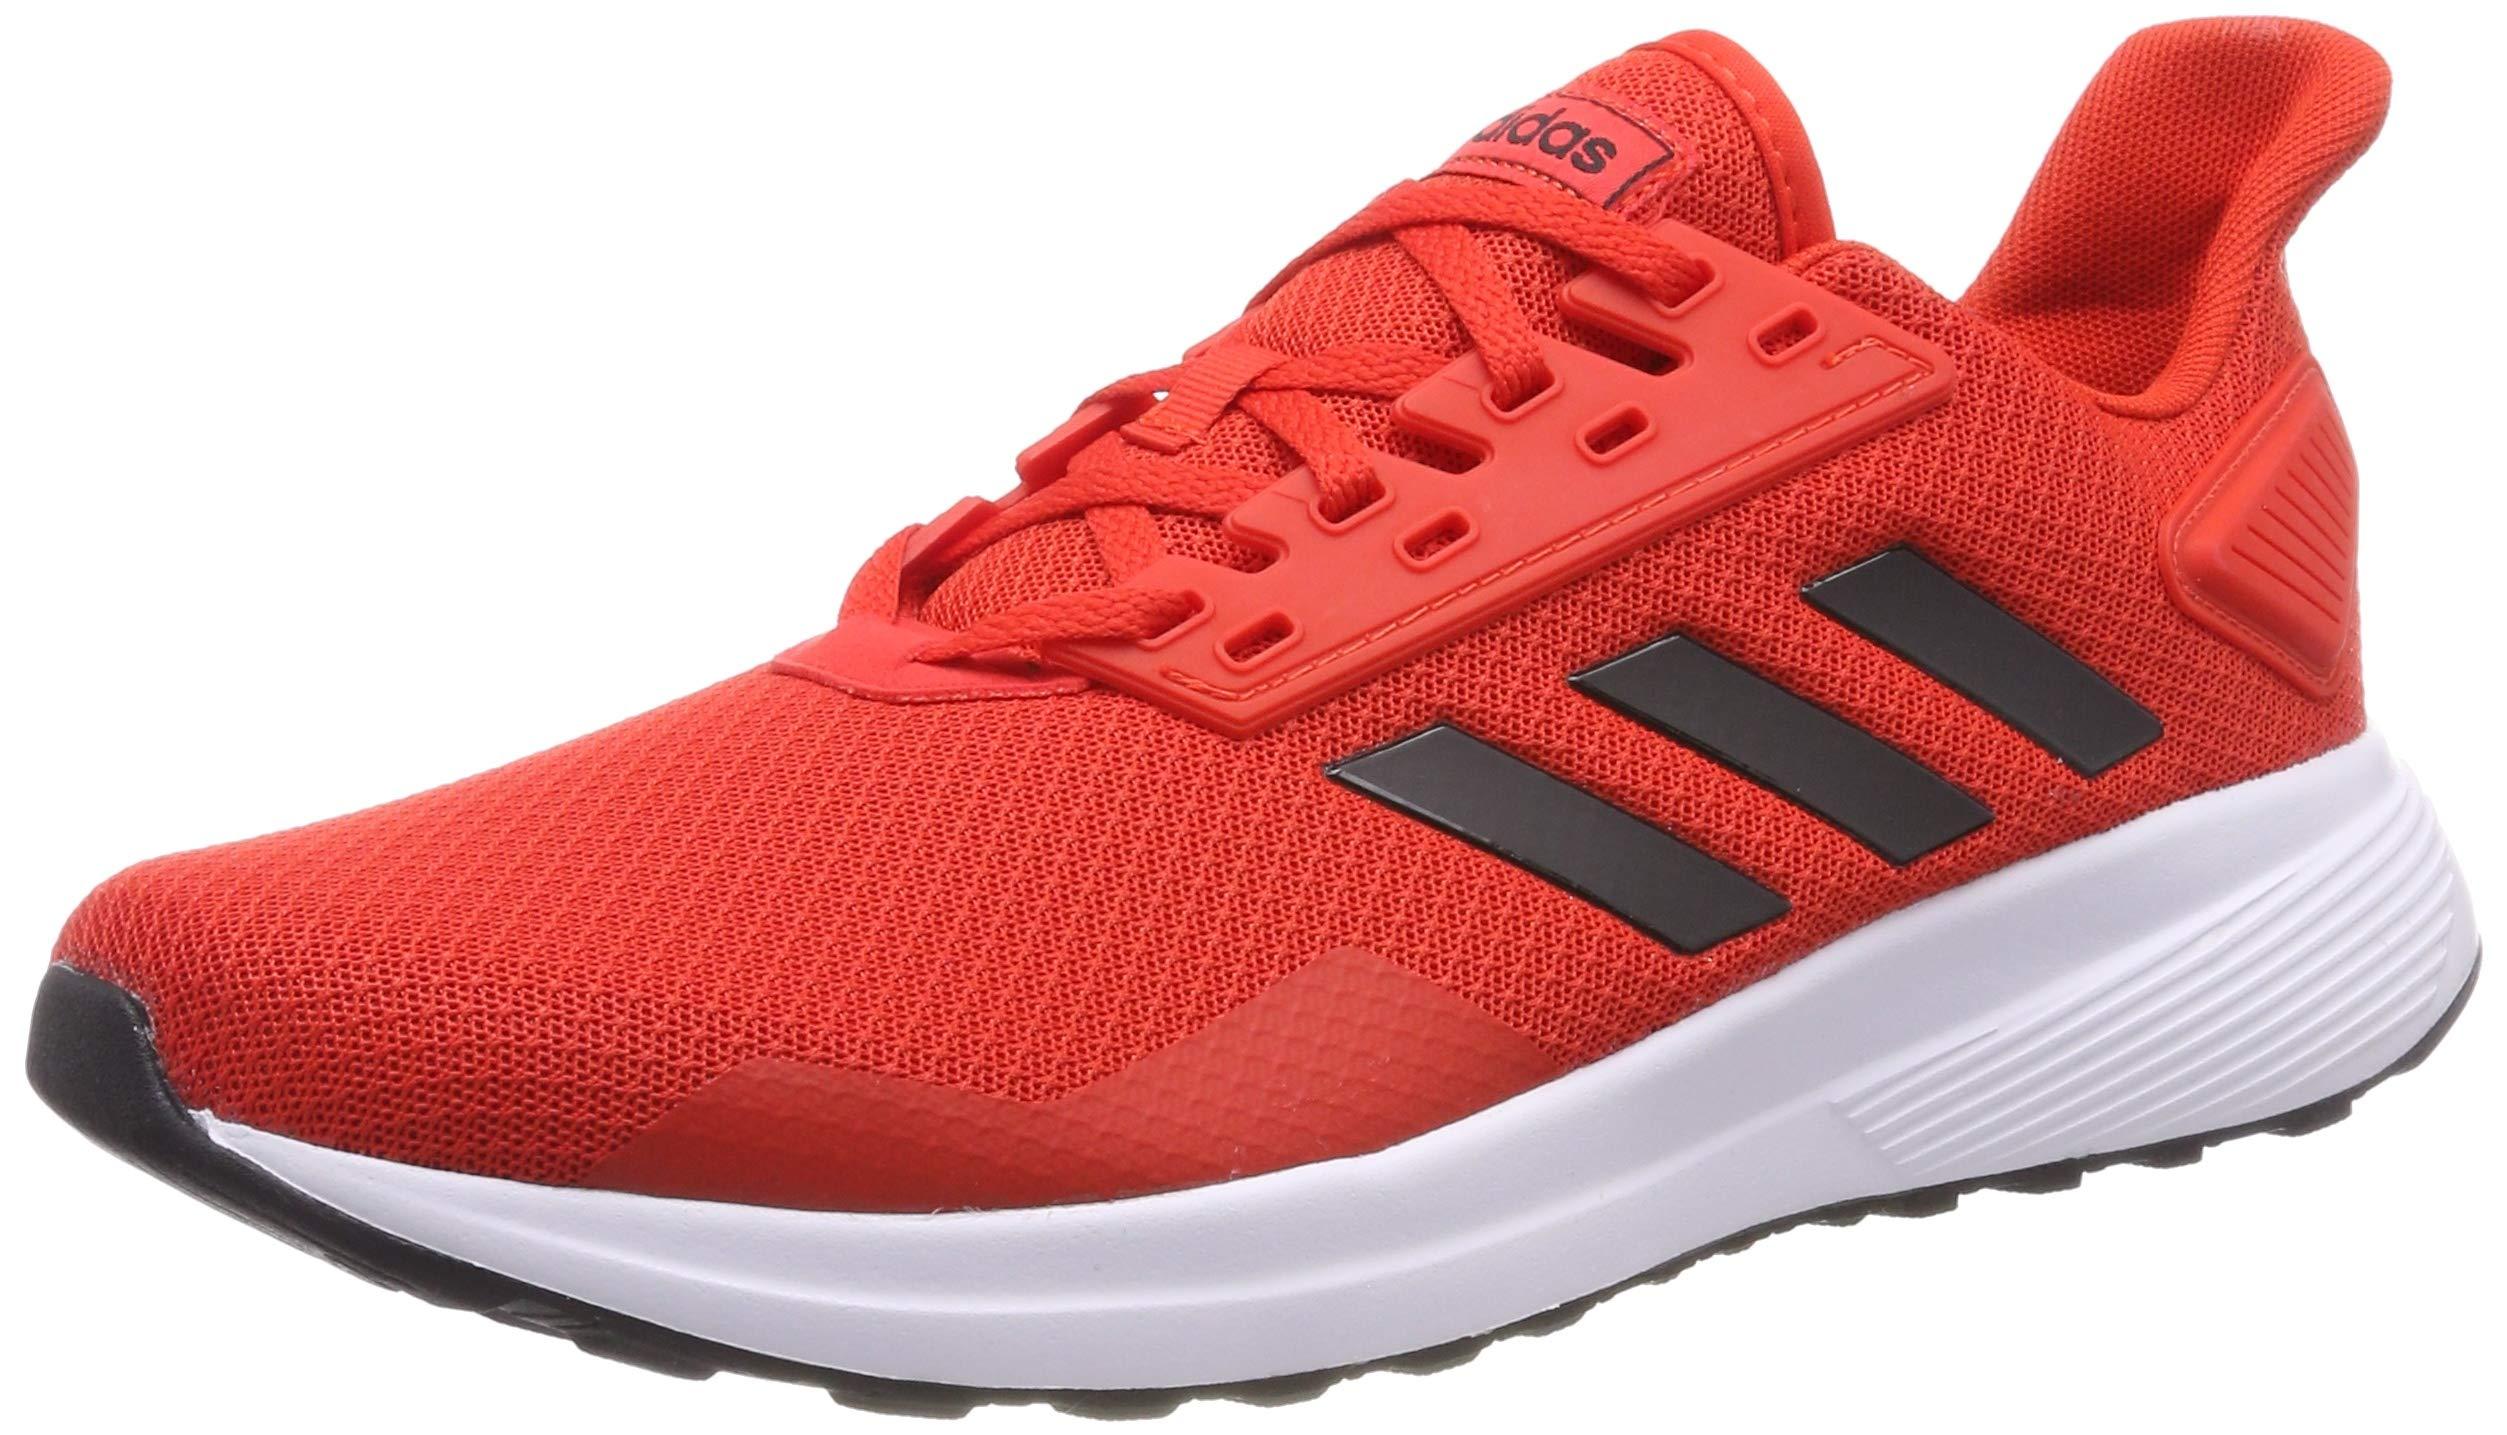 adidas Men Shoes Essential Duramo 9 Training Fitness Fashion (EU 39 1/3 - UK 6 - US 6.5)